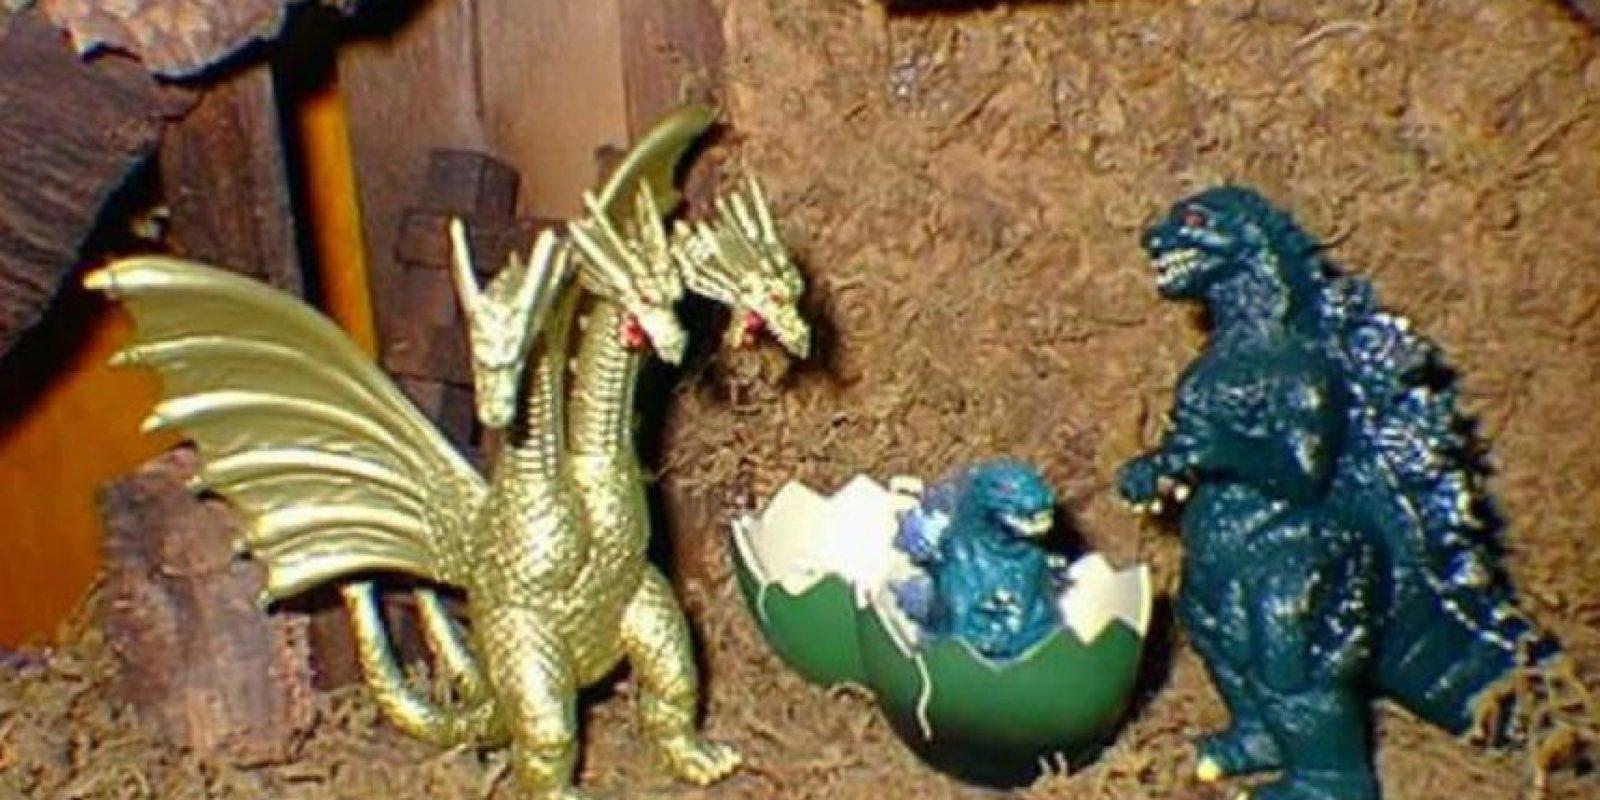 Jesús es ahora un bebé Godzilla Foto:Imgur